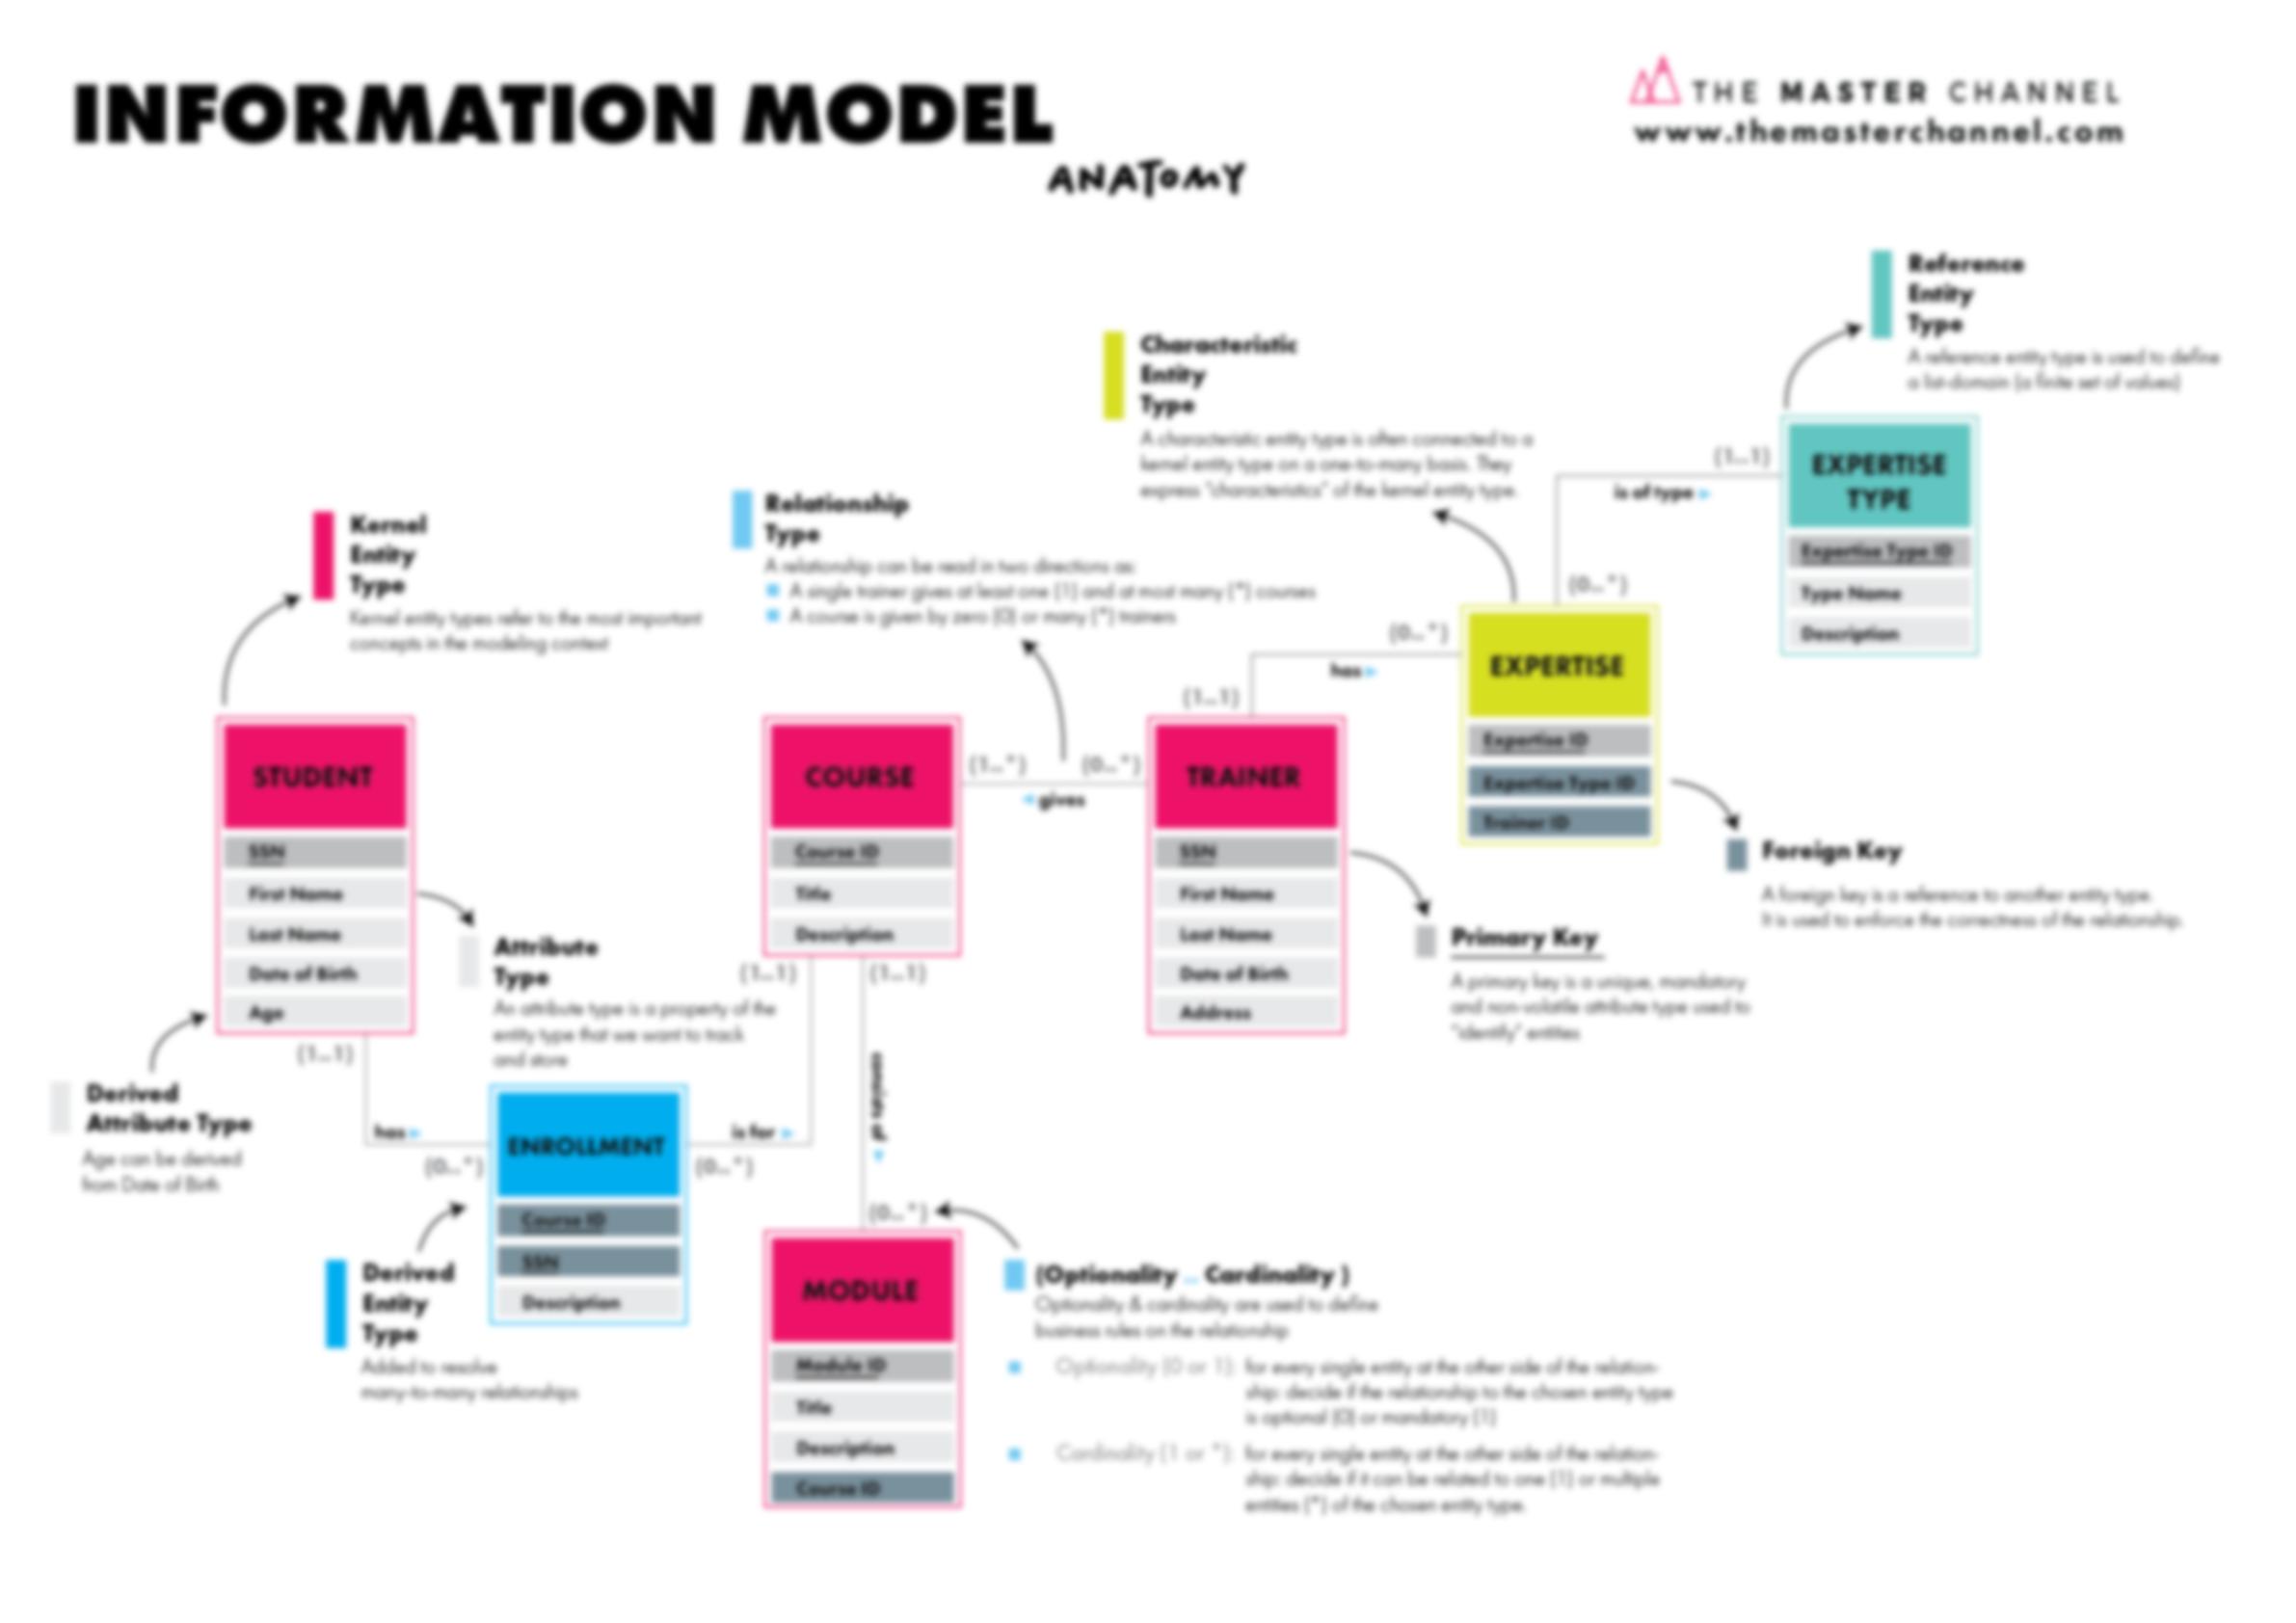 Information Model Anatomy Blurred Poster